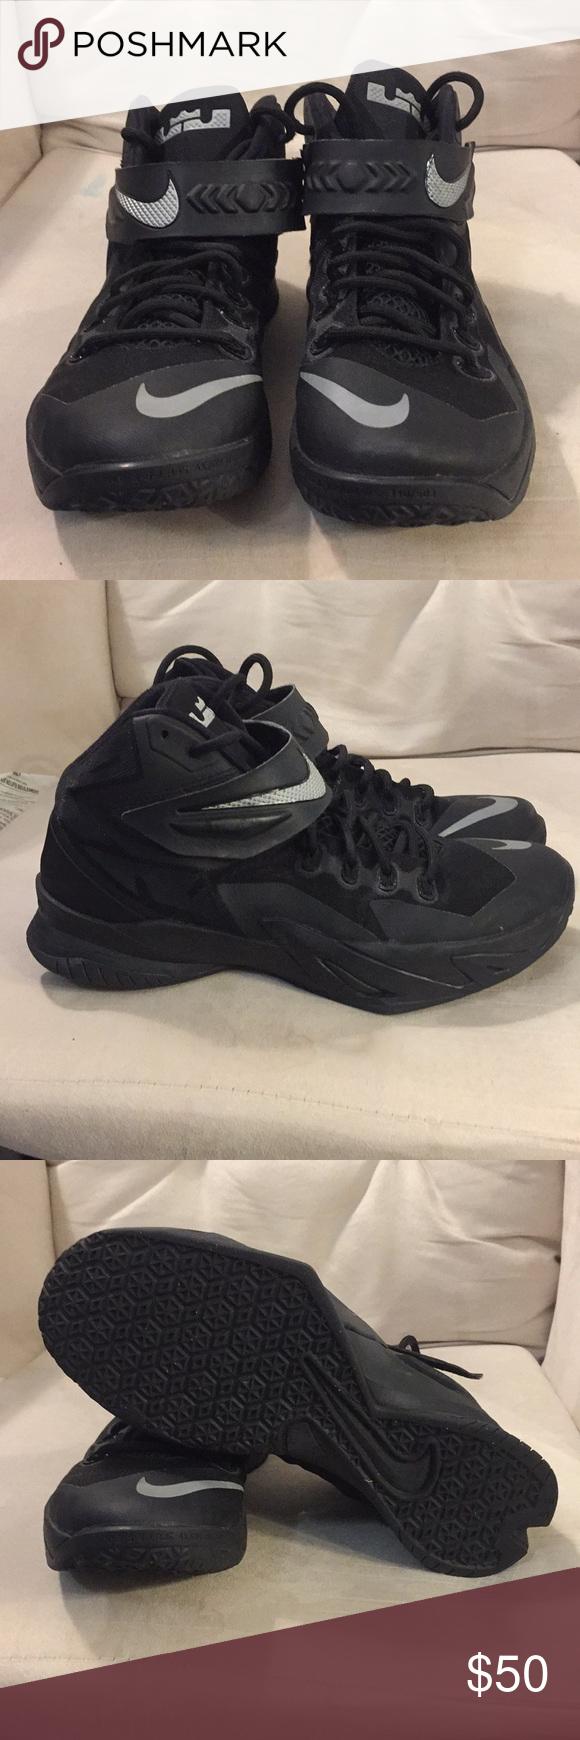 0479dd4e548 Nike LeBron Soldier 8 Worn a few times good condition 8 10